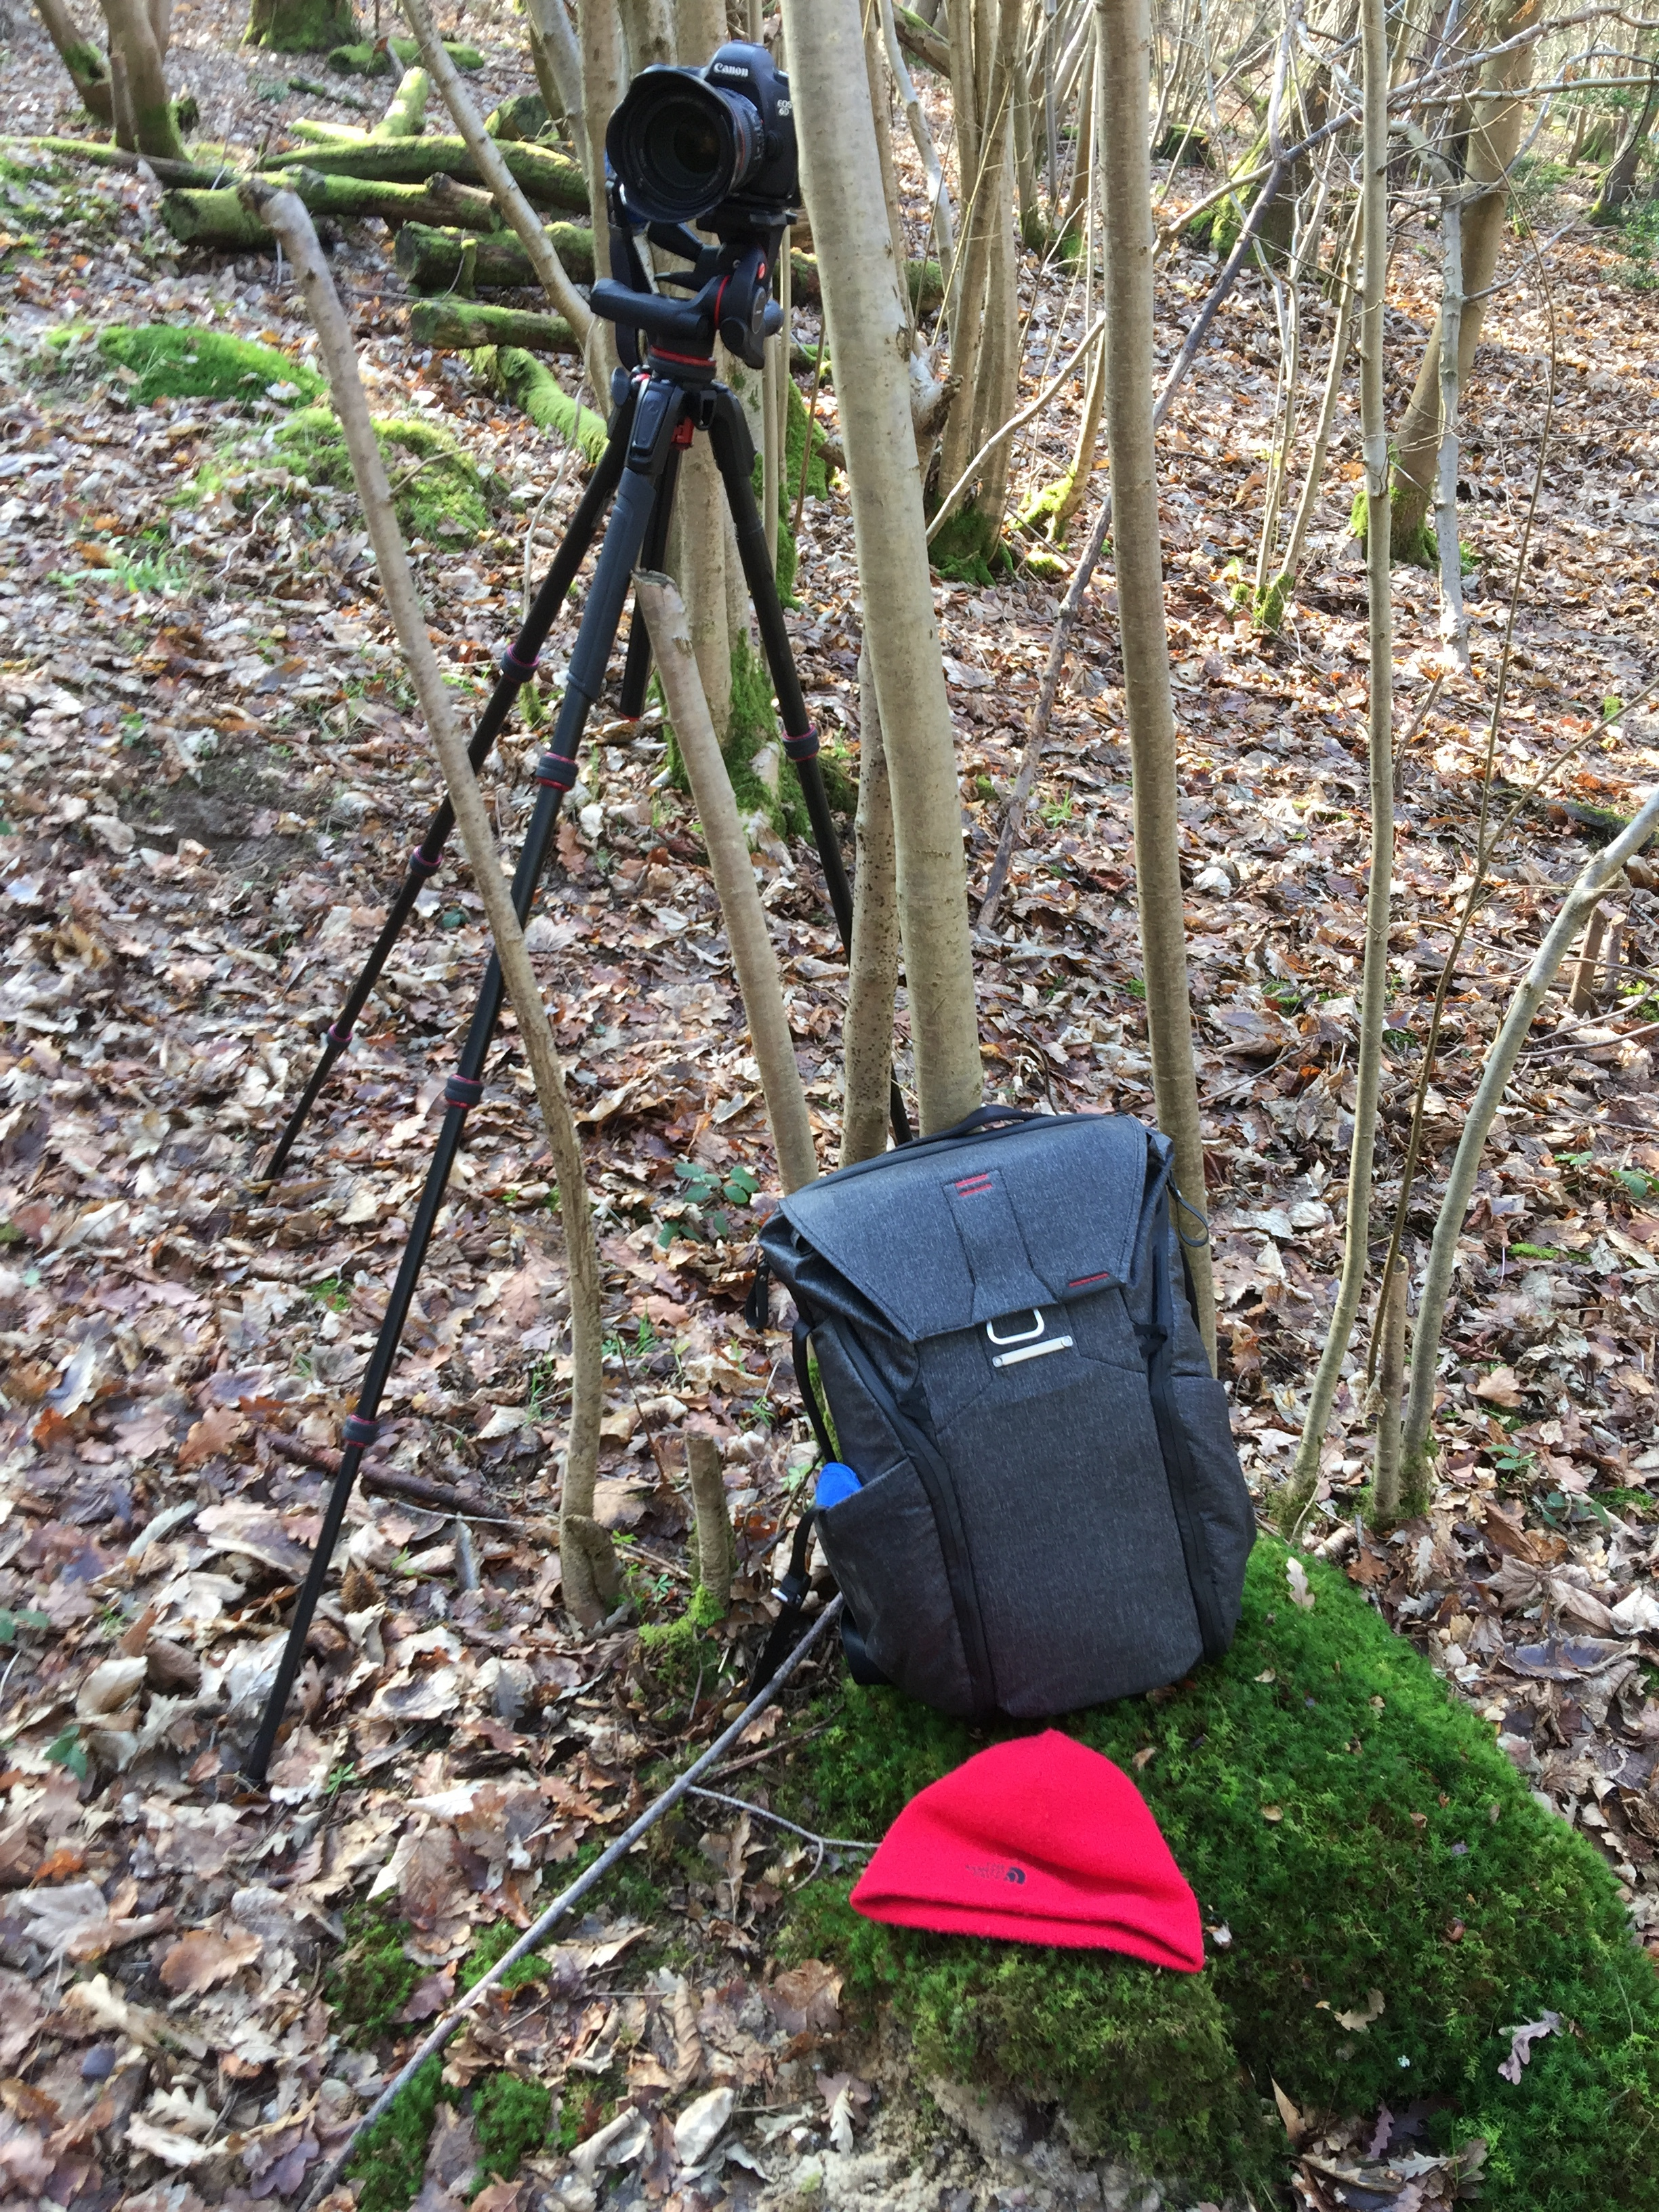 My go to camera gear